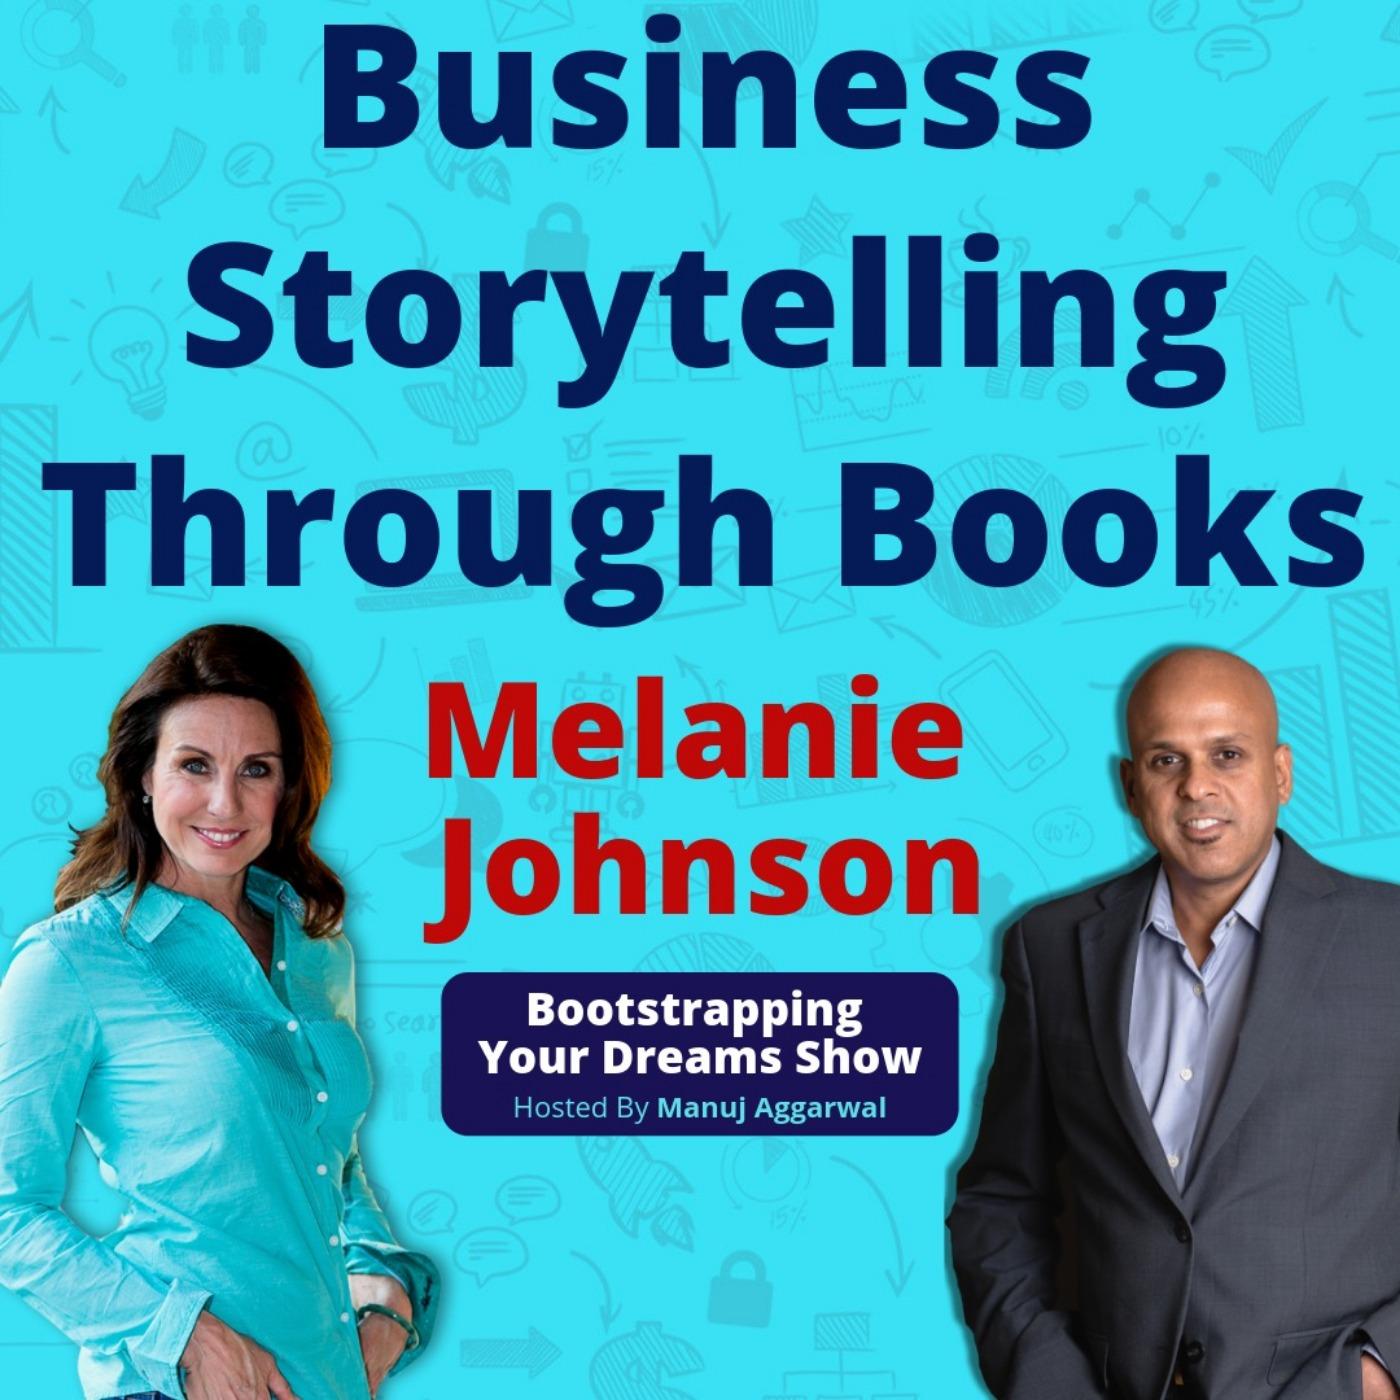 067   Business Storytelling Through Books   Publishing Business   With Melanie Johnson